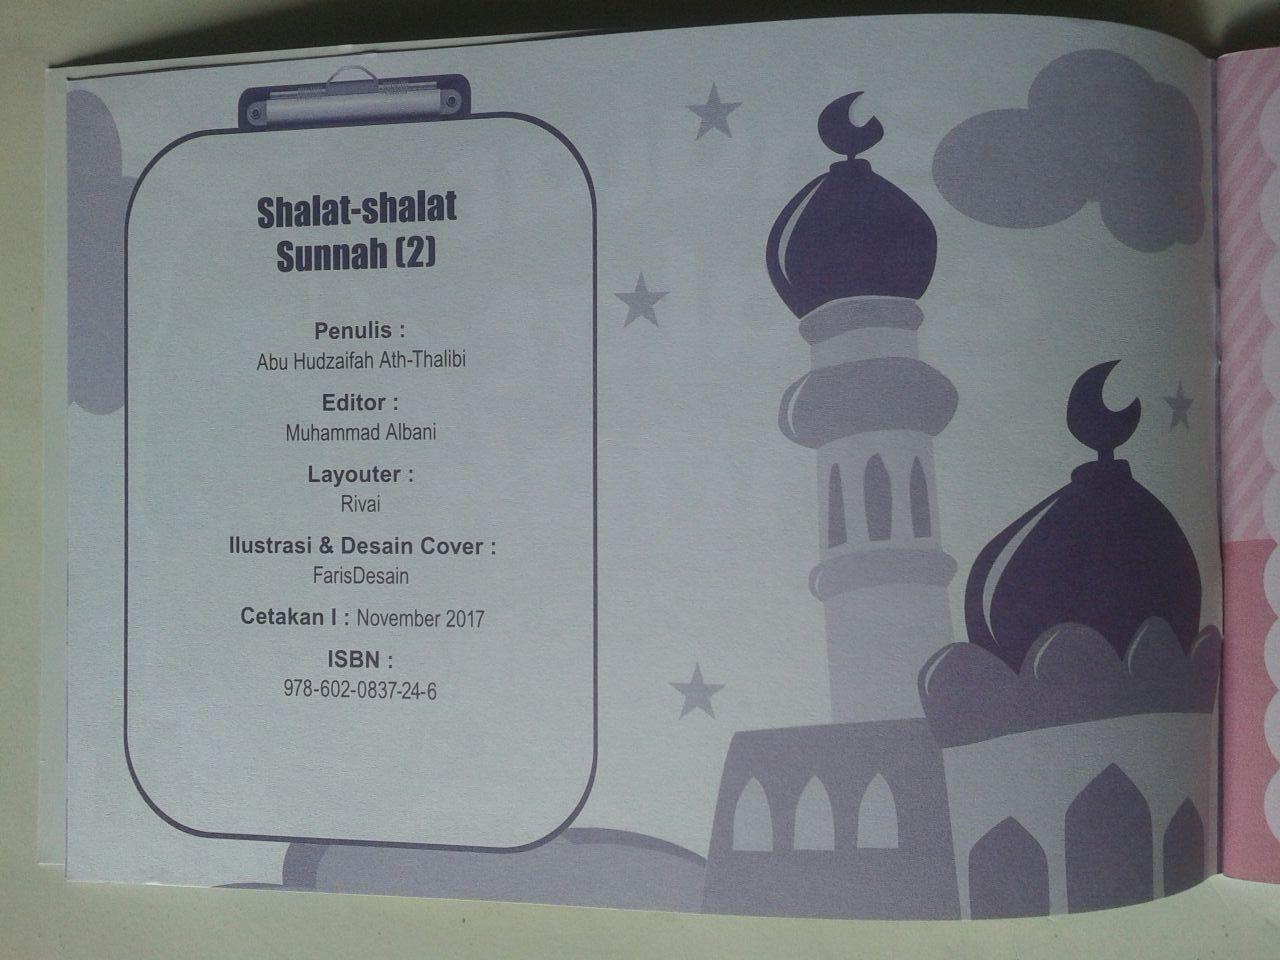 Buku Anak Shalat Shalat Sunnah Sesuai Tuntunan Nabi 2 isi 2